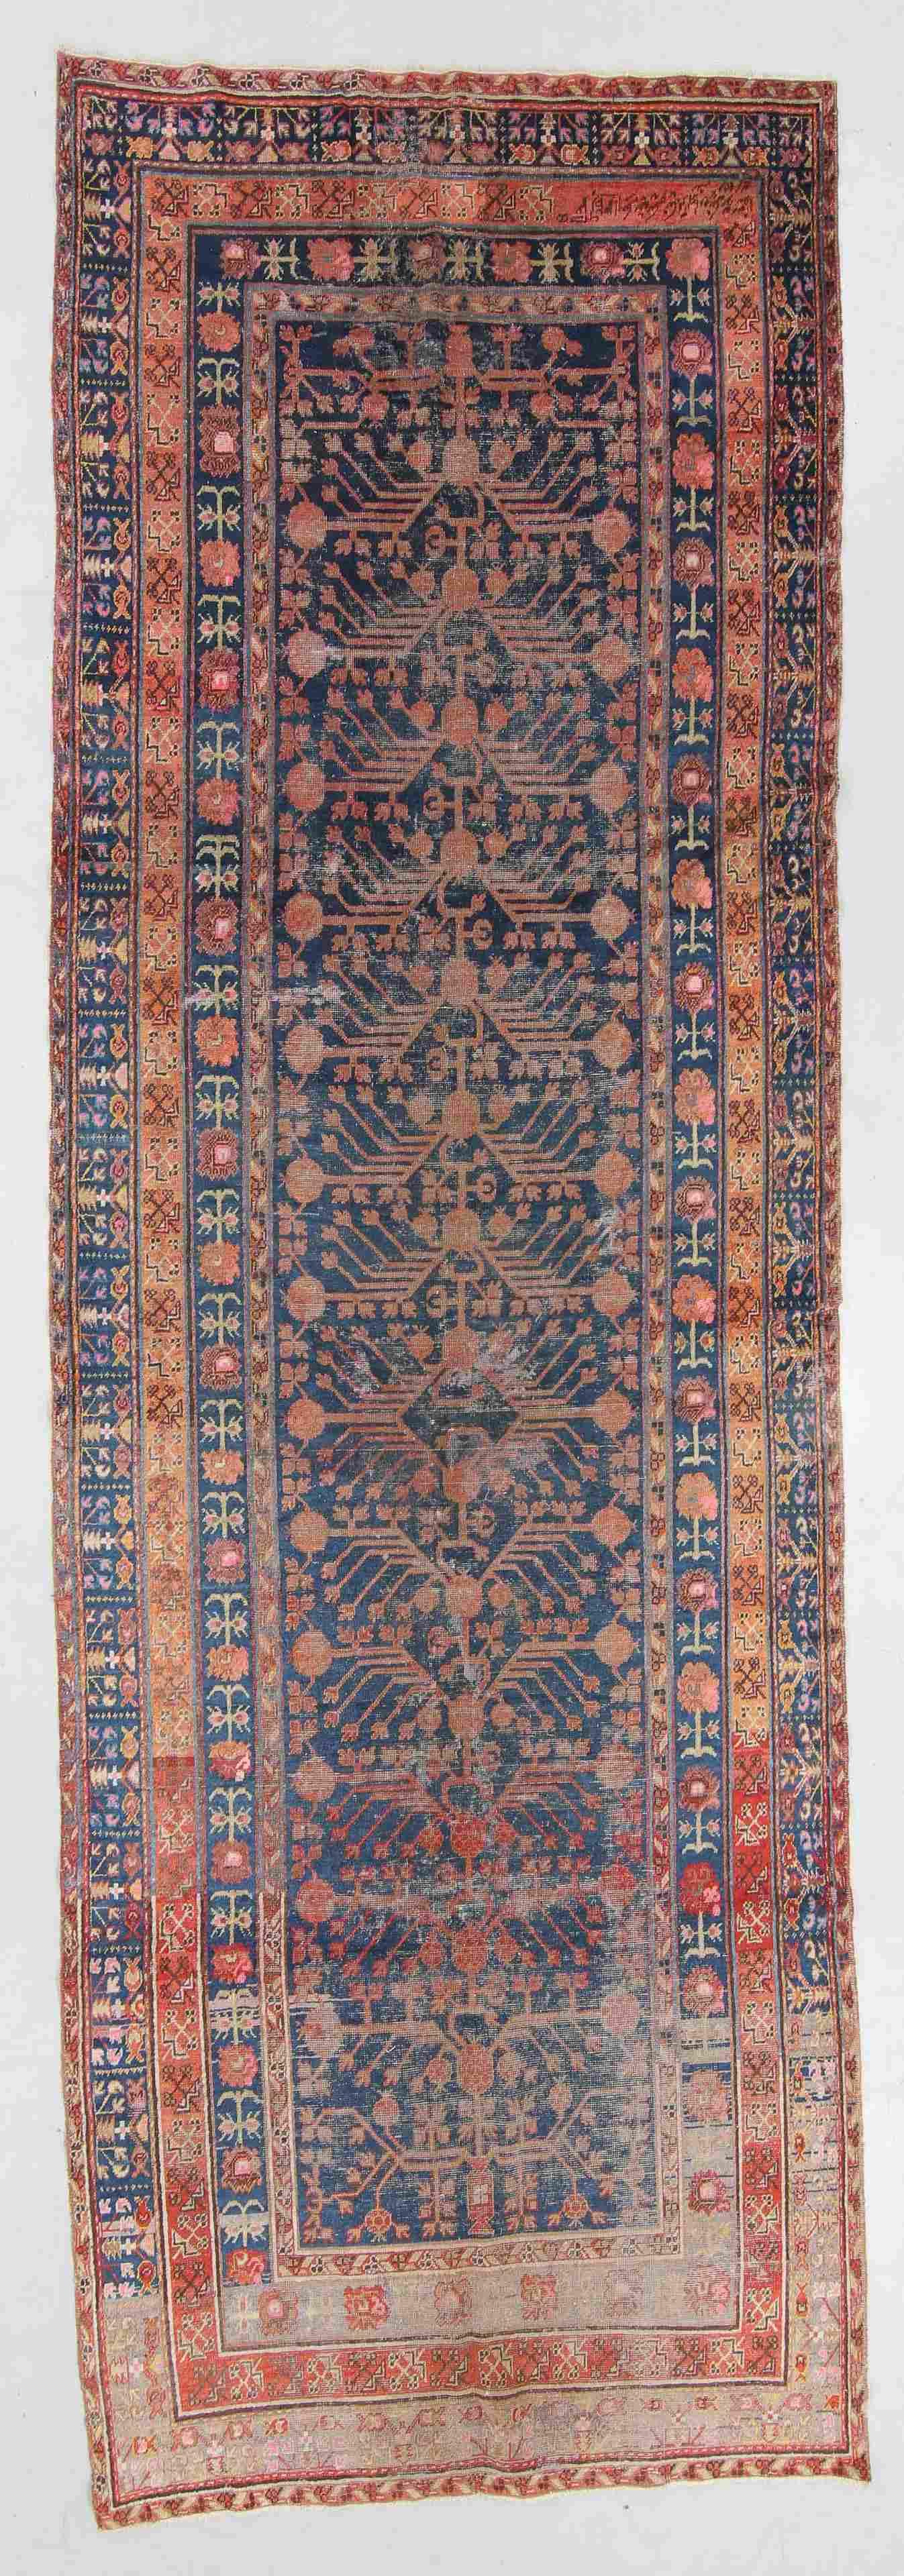 Antique Khotan Rug, China: 5